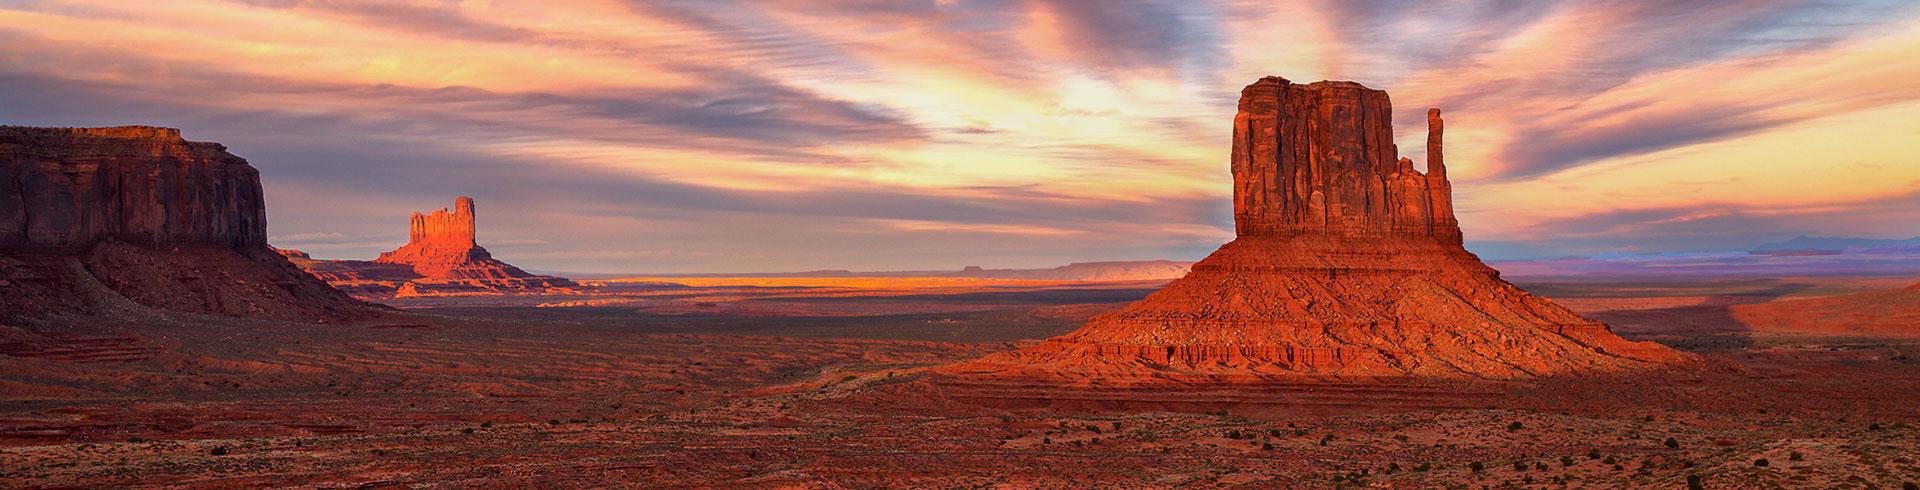 Arizona mountains and valleys